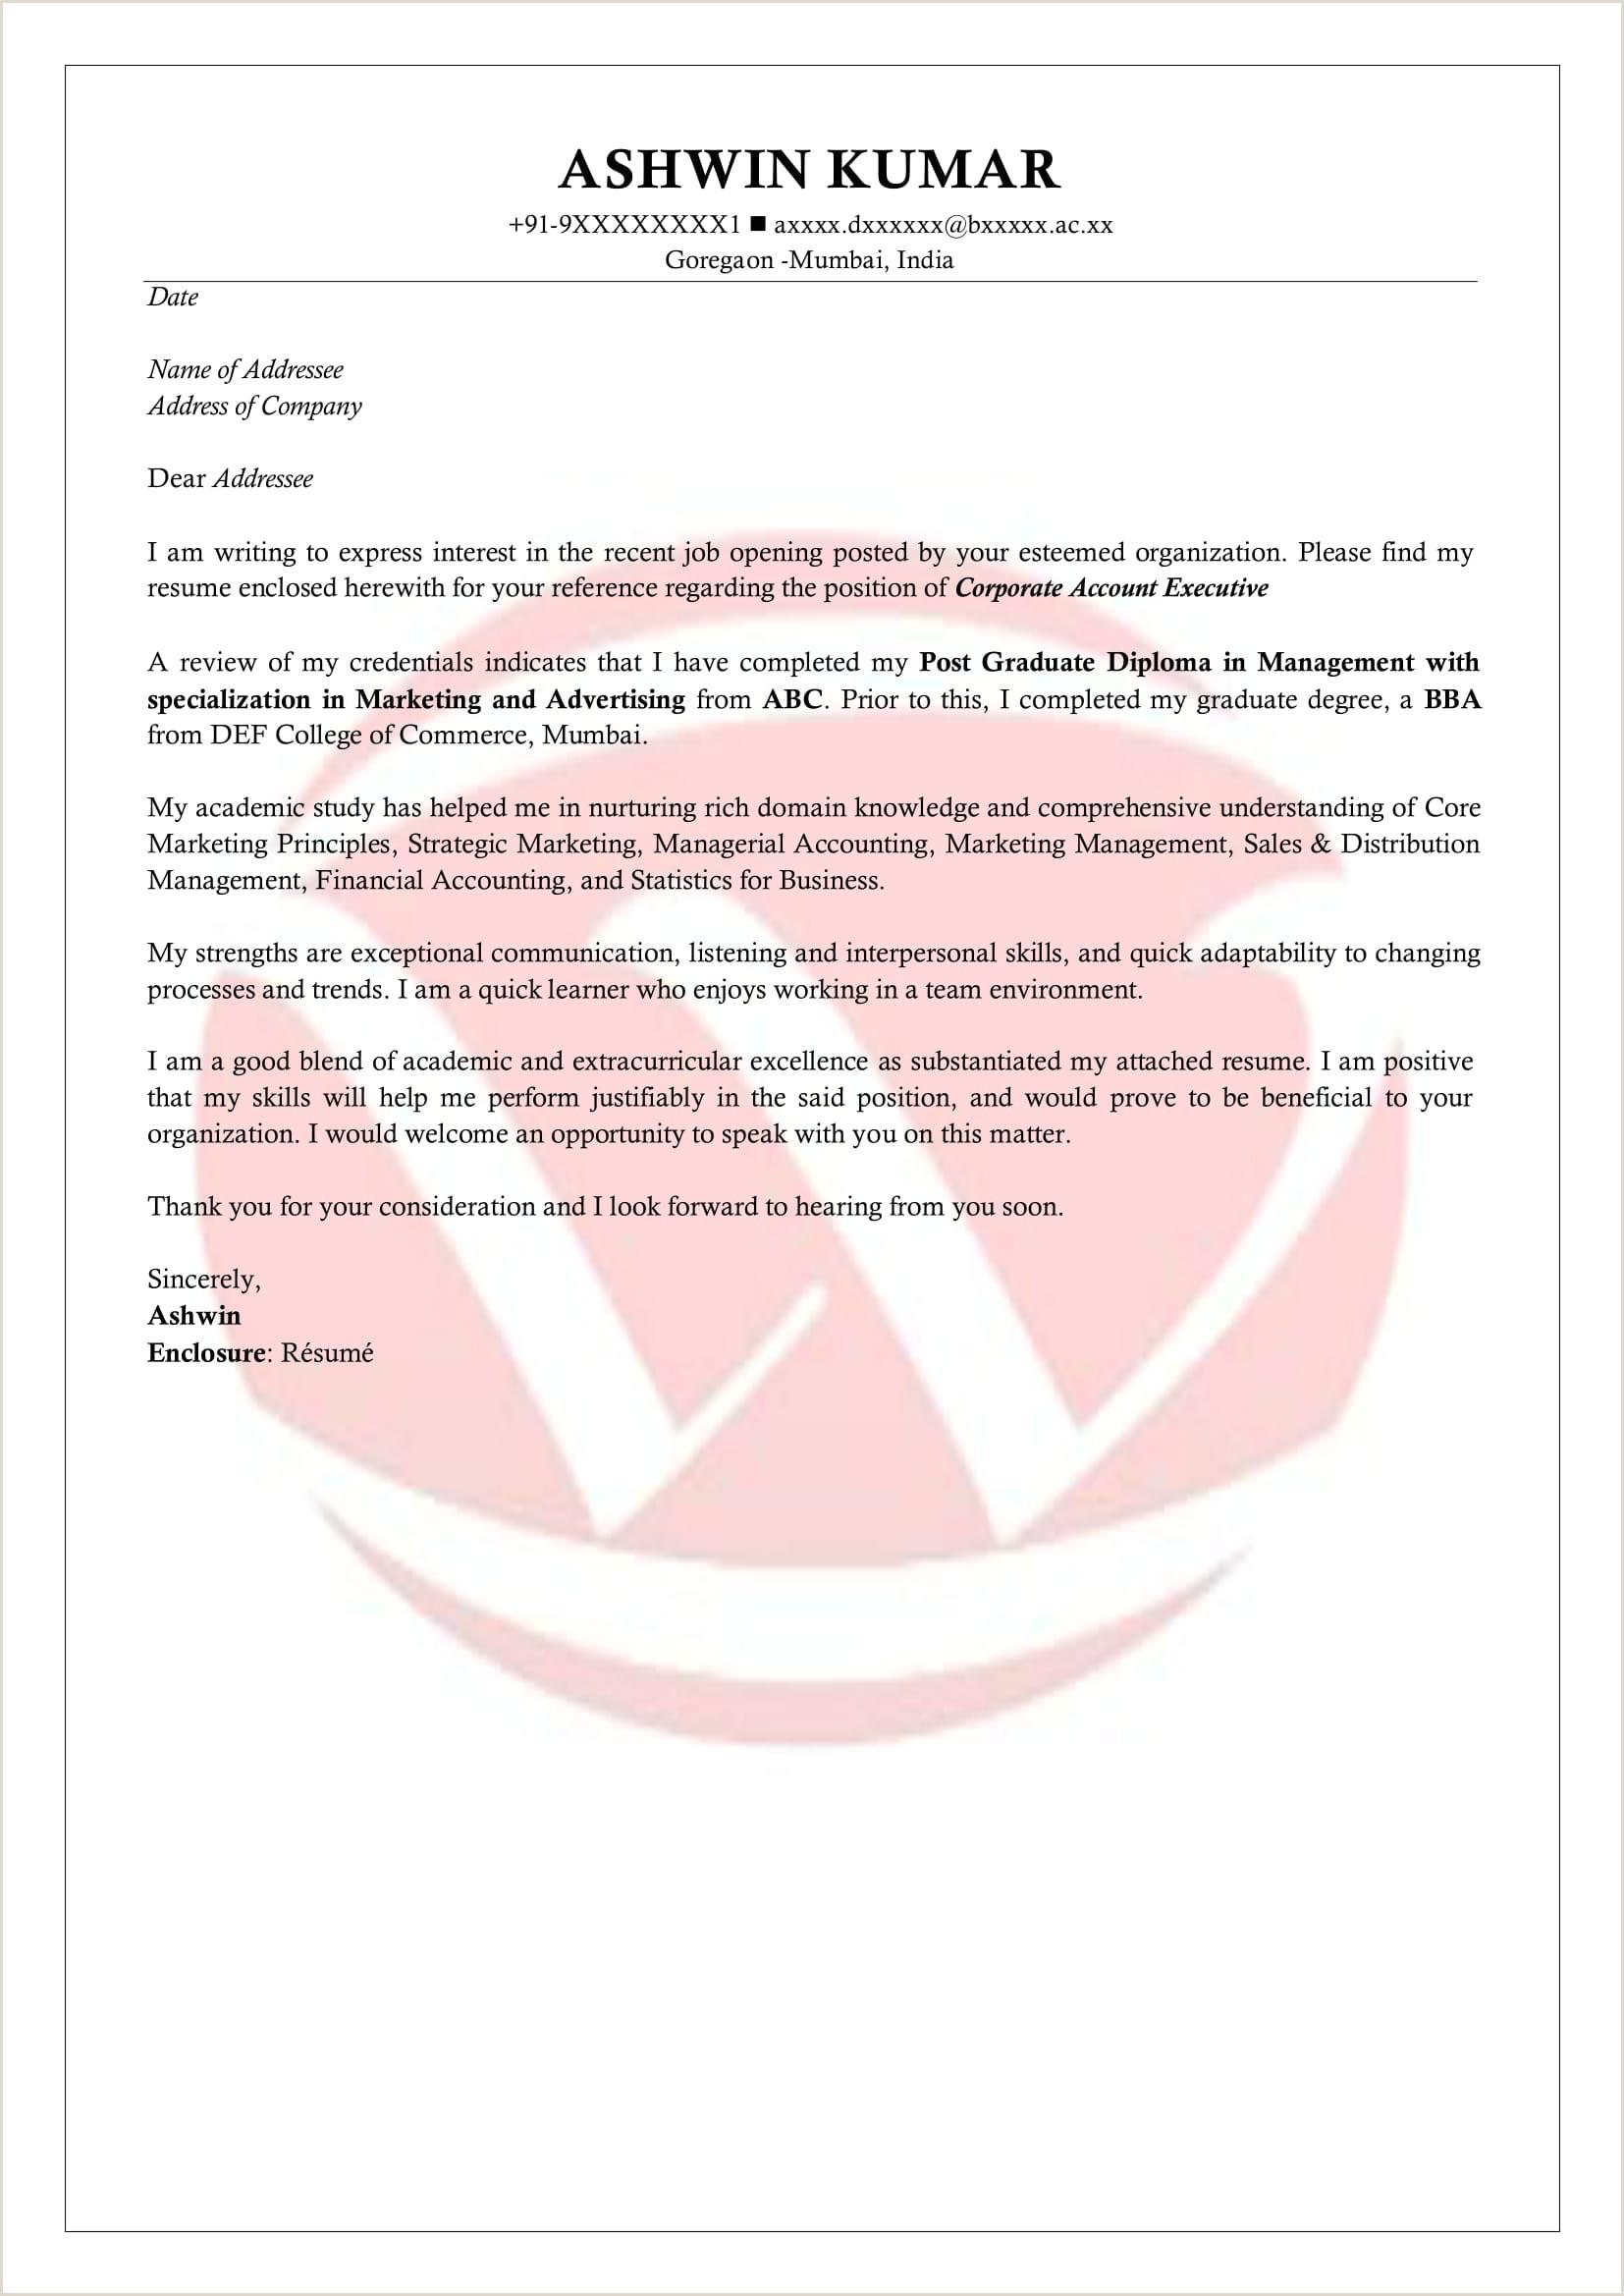 Fresher Resume Format Doc Freshers Sample Cover Letter Format Download Cover Letter